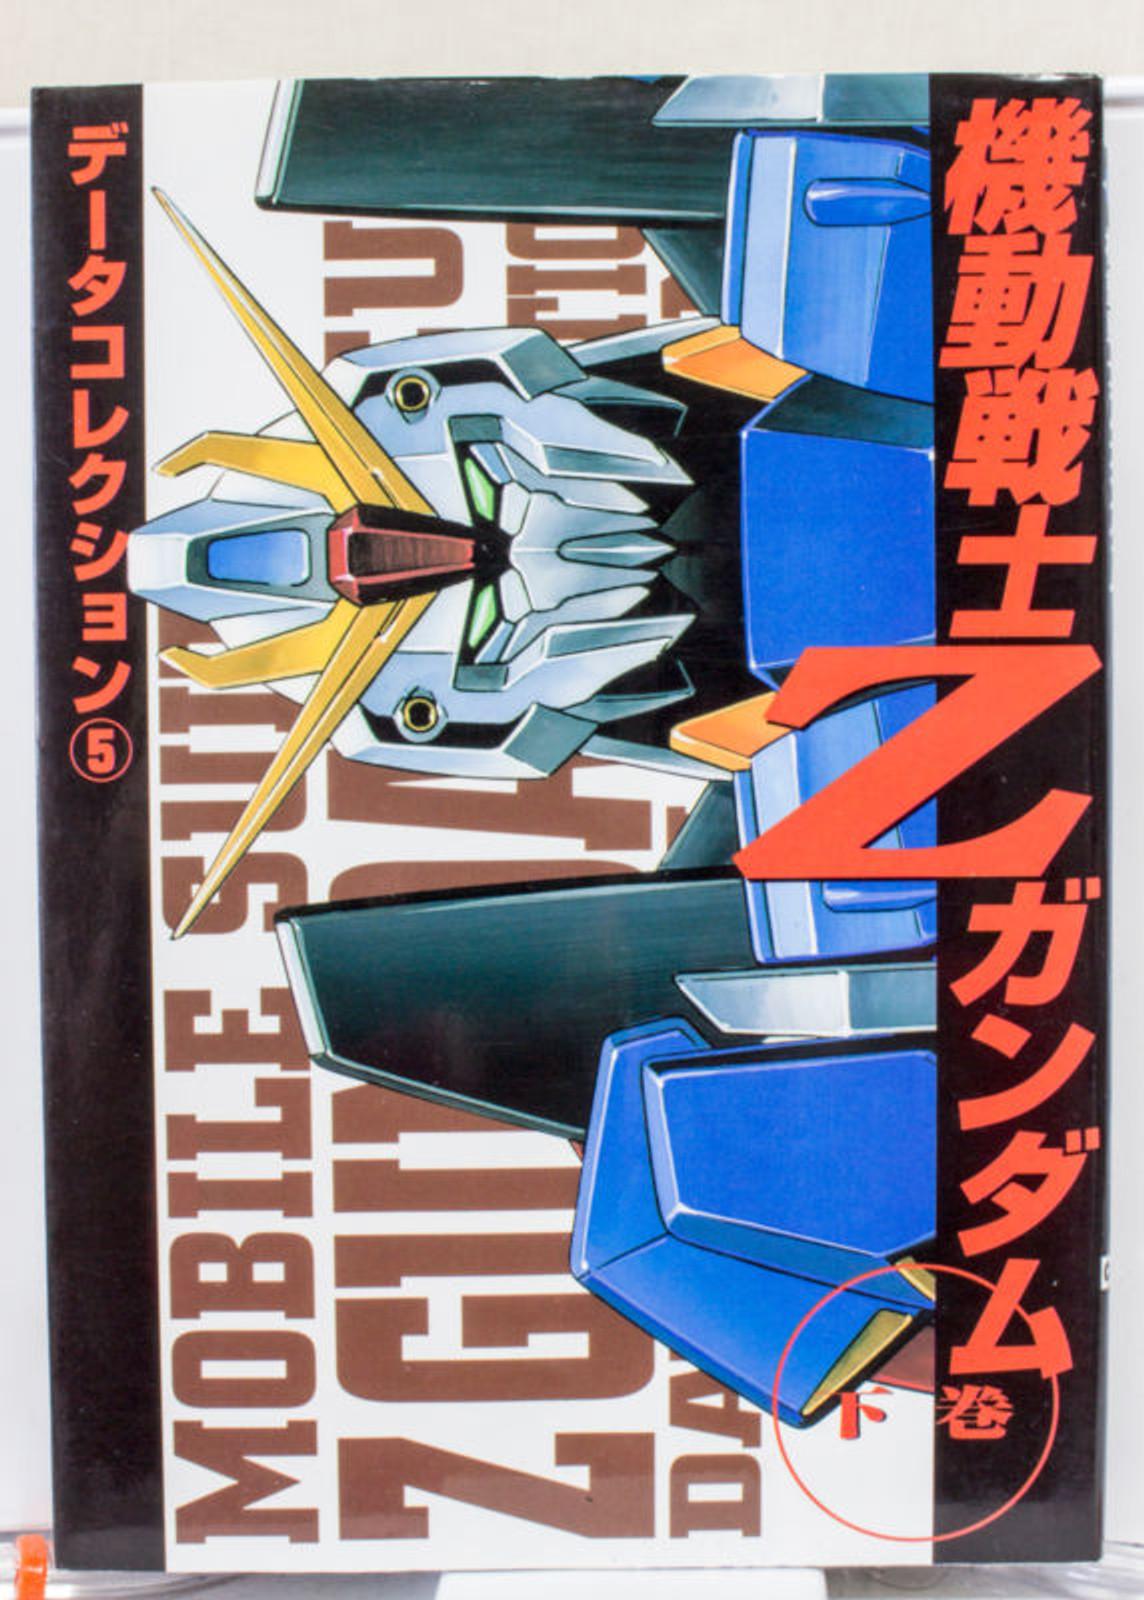 Z Gundam Vol.2 Date Collection #5 Illustration Art Book JAPAN ANIME